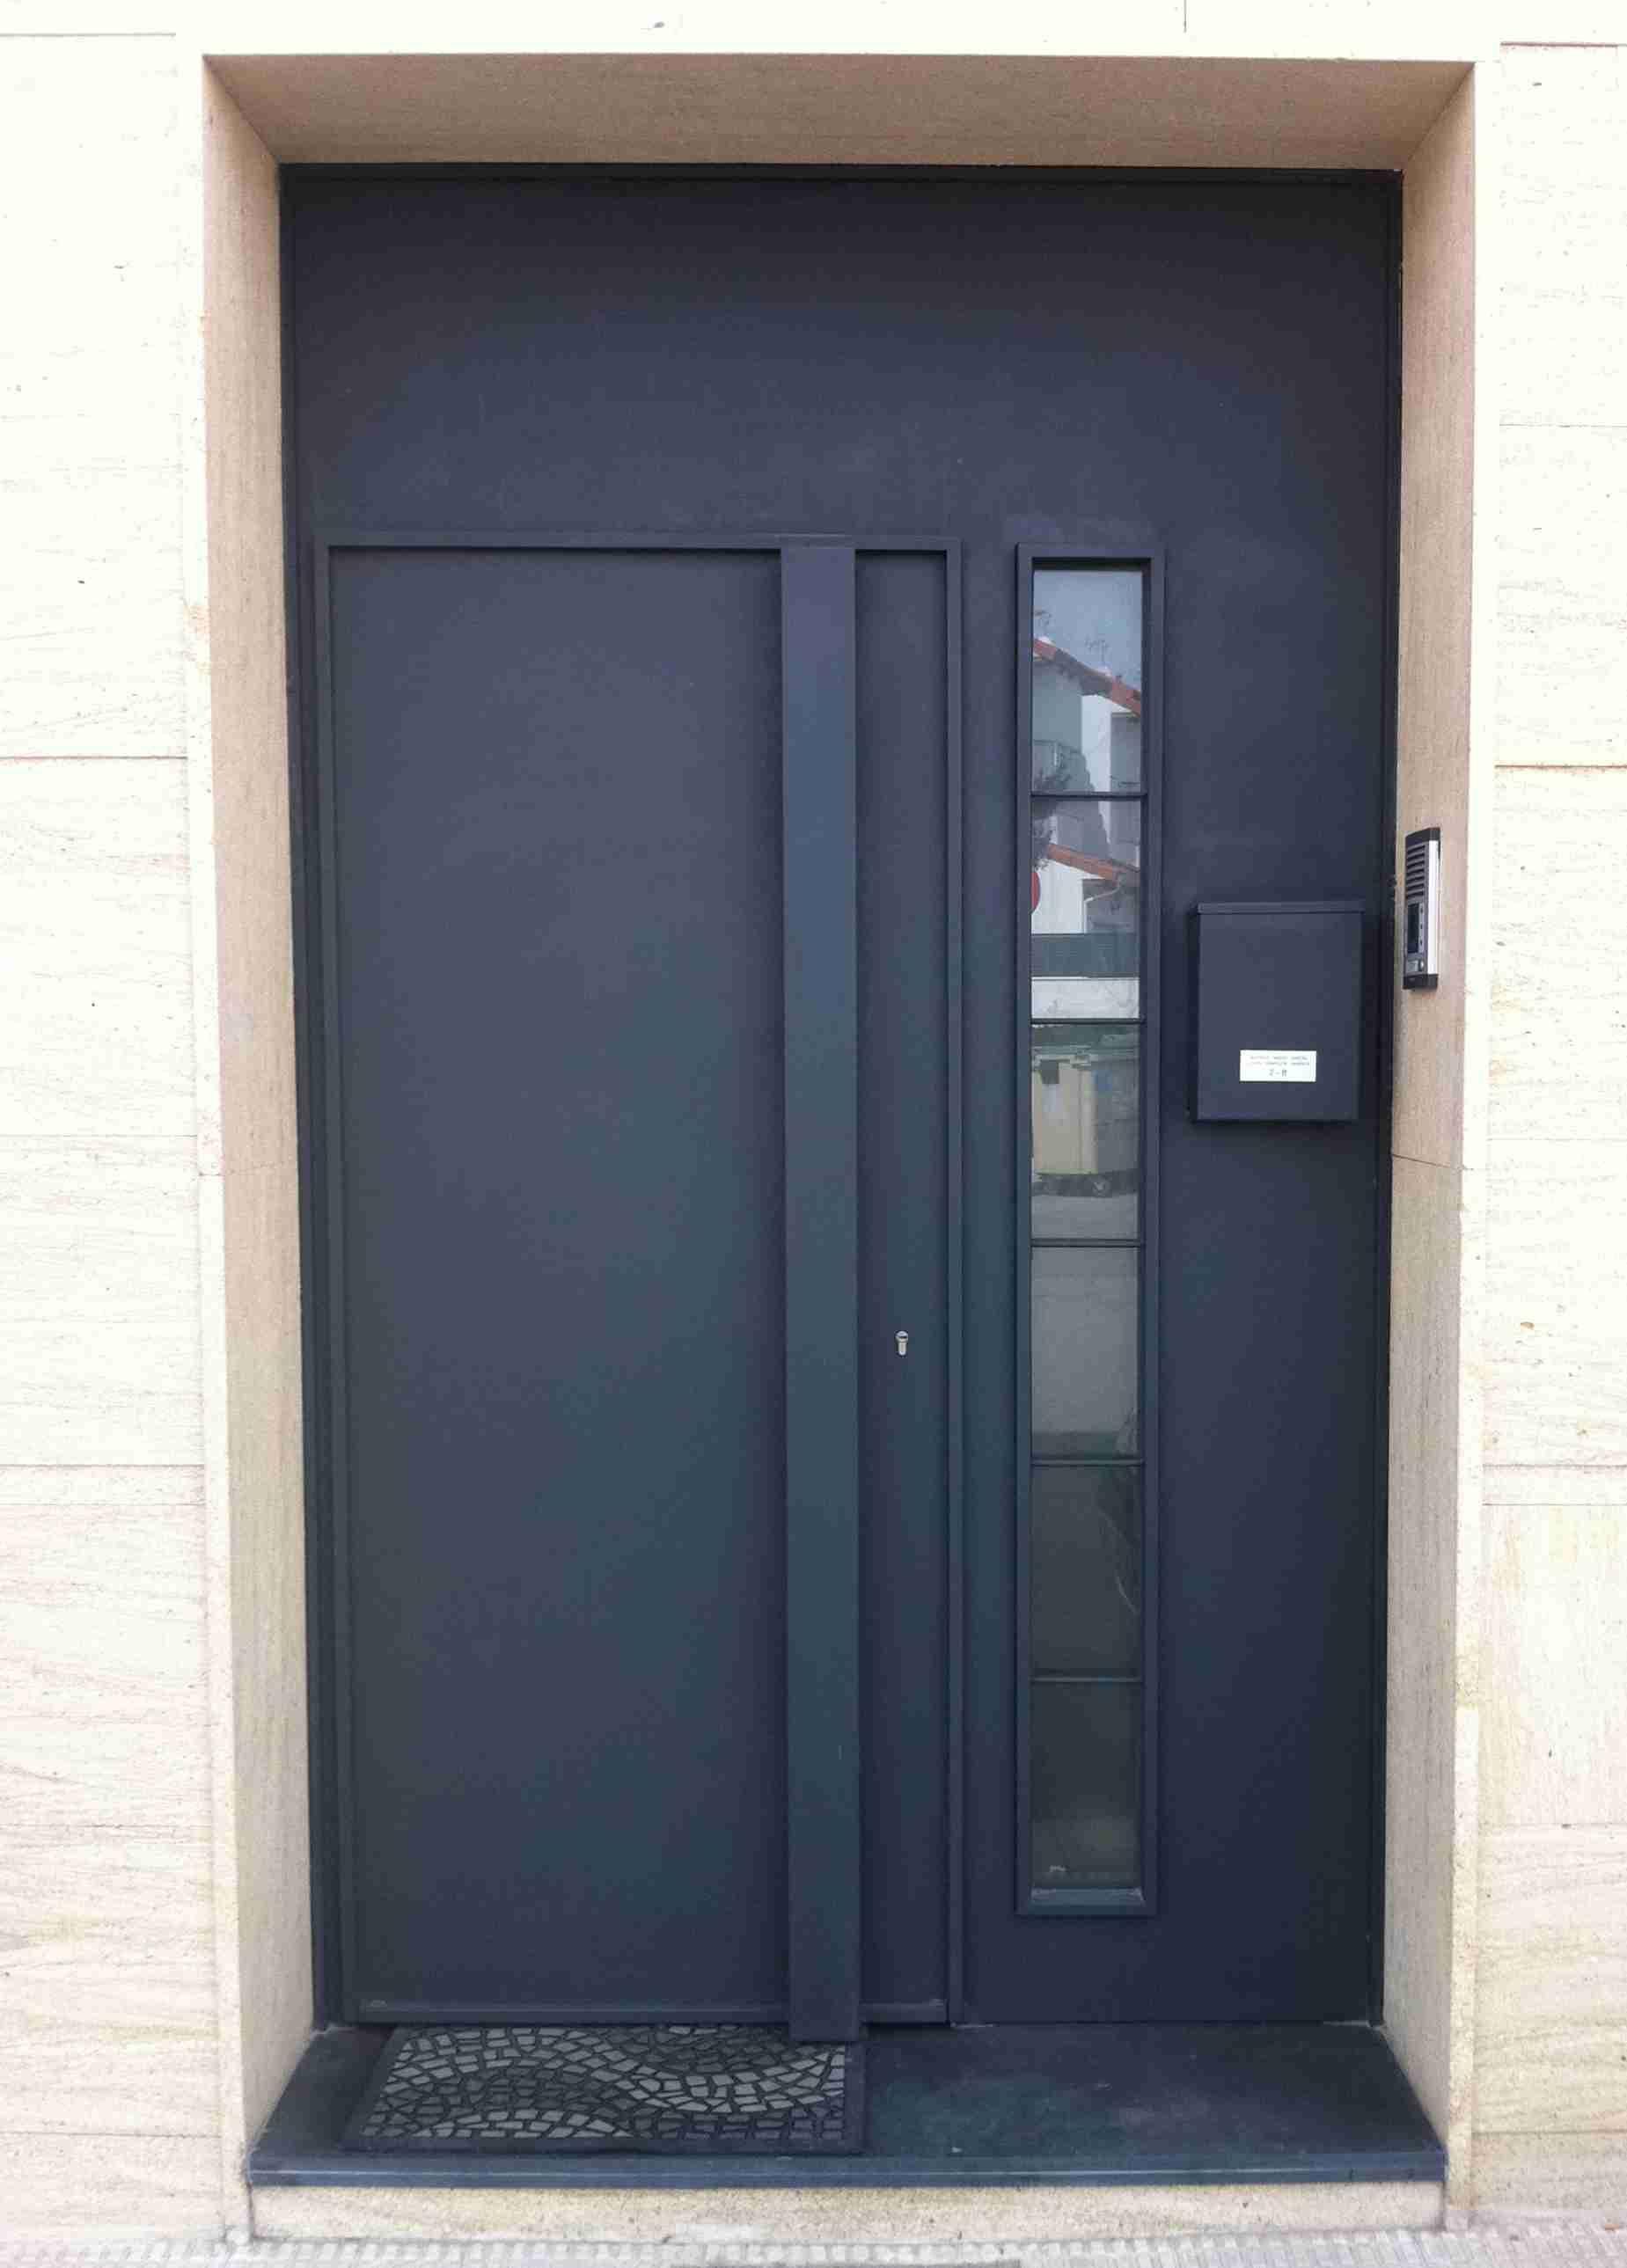 Modelo de puerta de hierro sencilla pesquisa google for Puertas en aluminio modernas